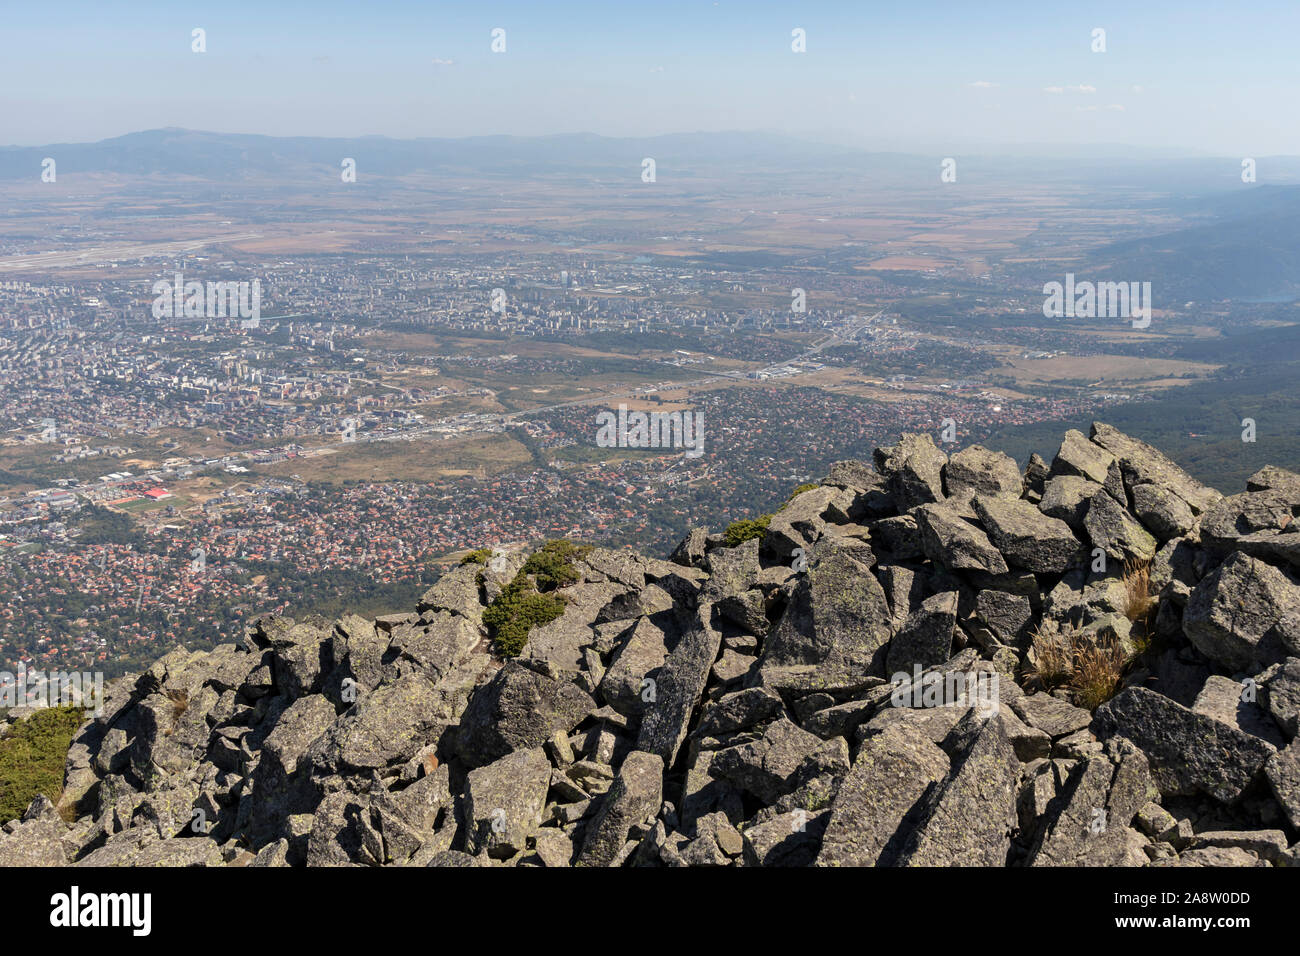 Amazing panorama of city of Sofia from Kamen Del Peak at Vitosha Mountain, Bulgaria Stock Photo